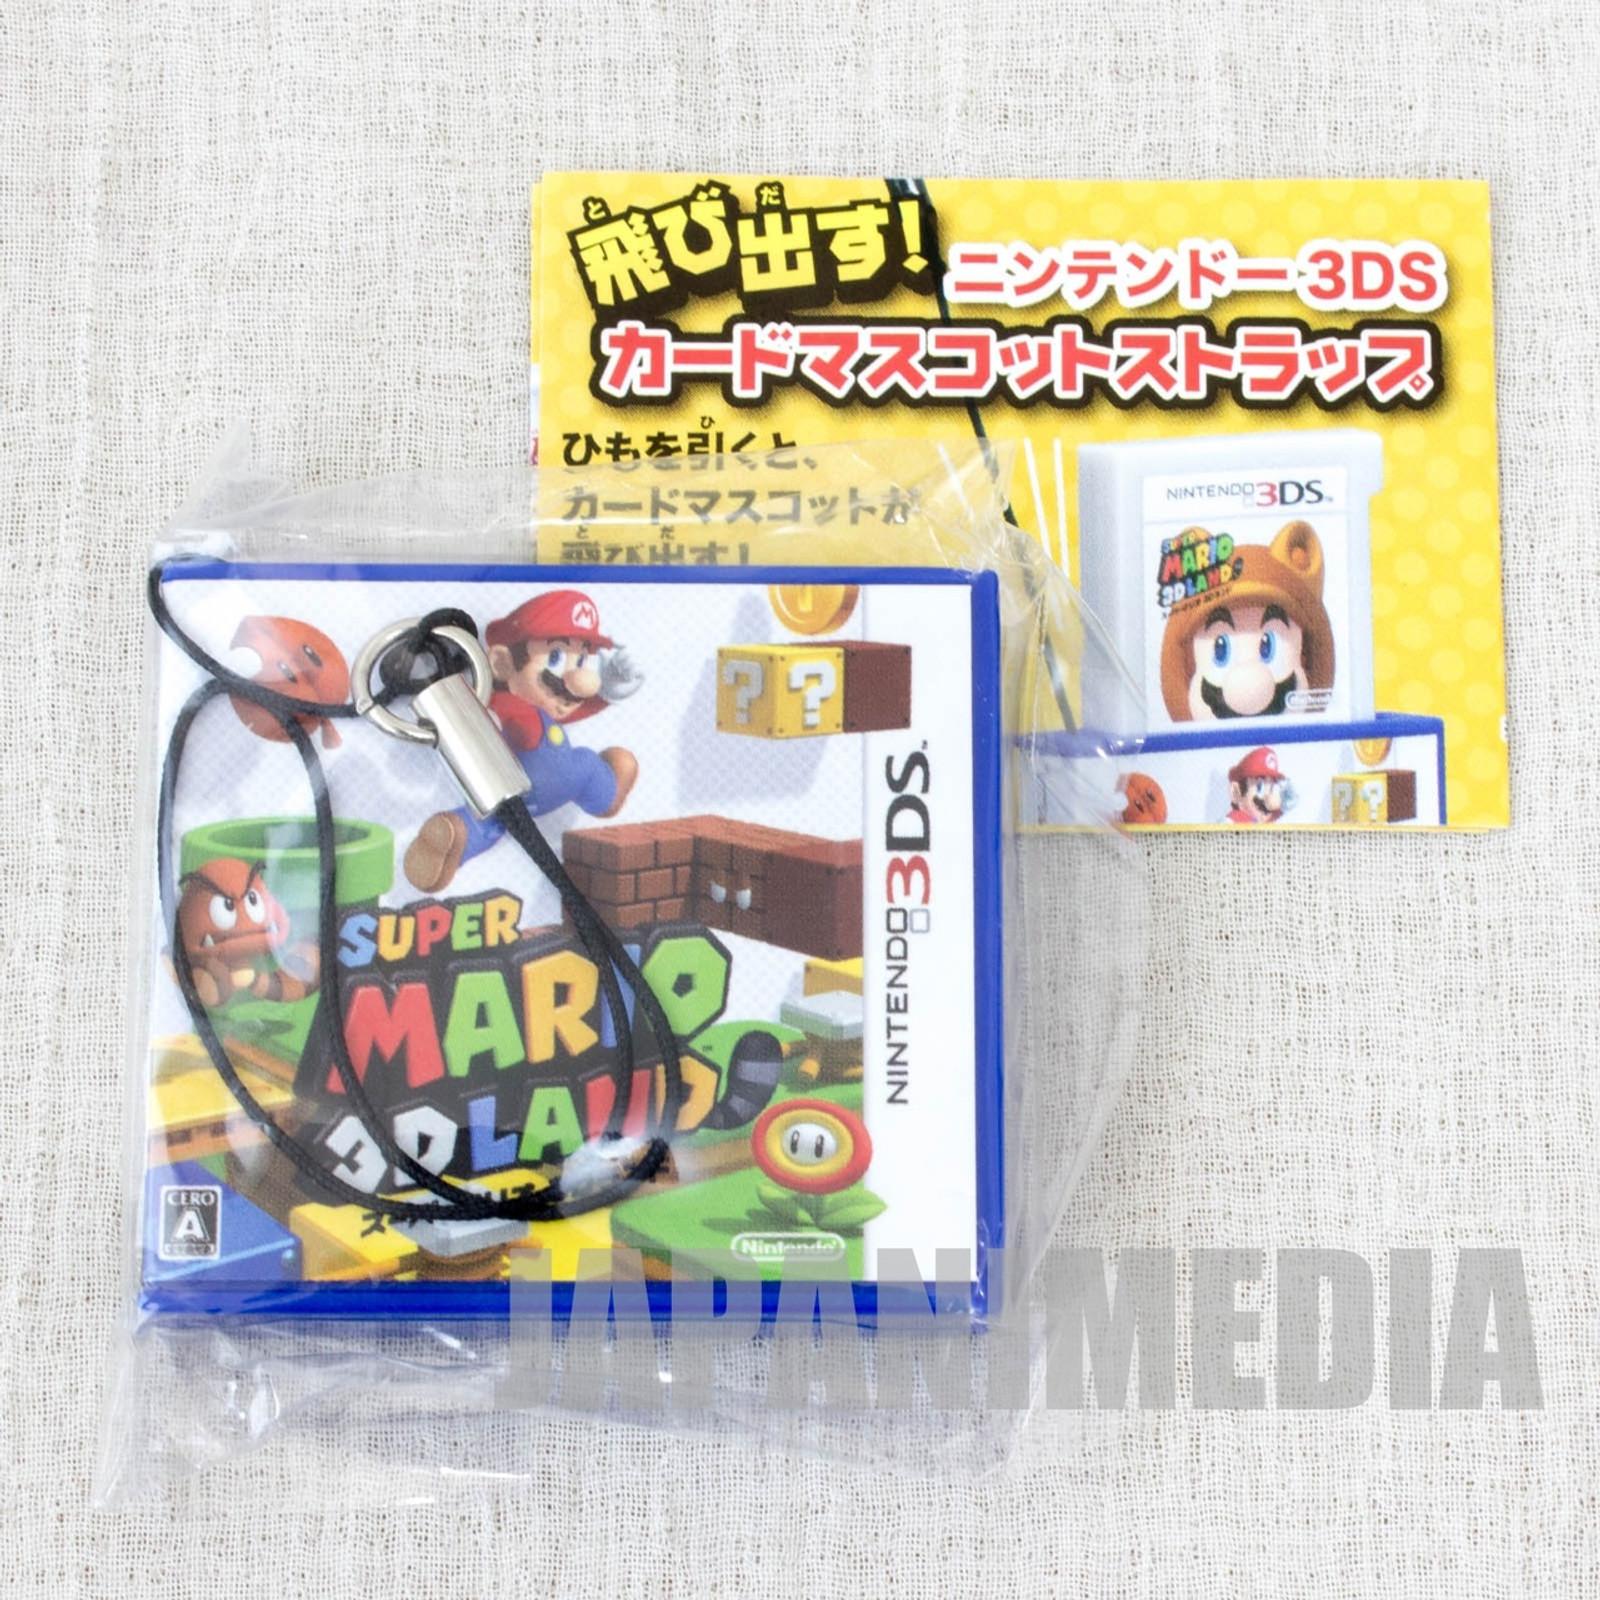 Super Mario 3D LAND Card Mascot Strap NINTENDO DS Epoch JAPAN GAME